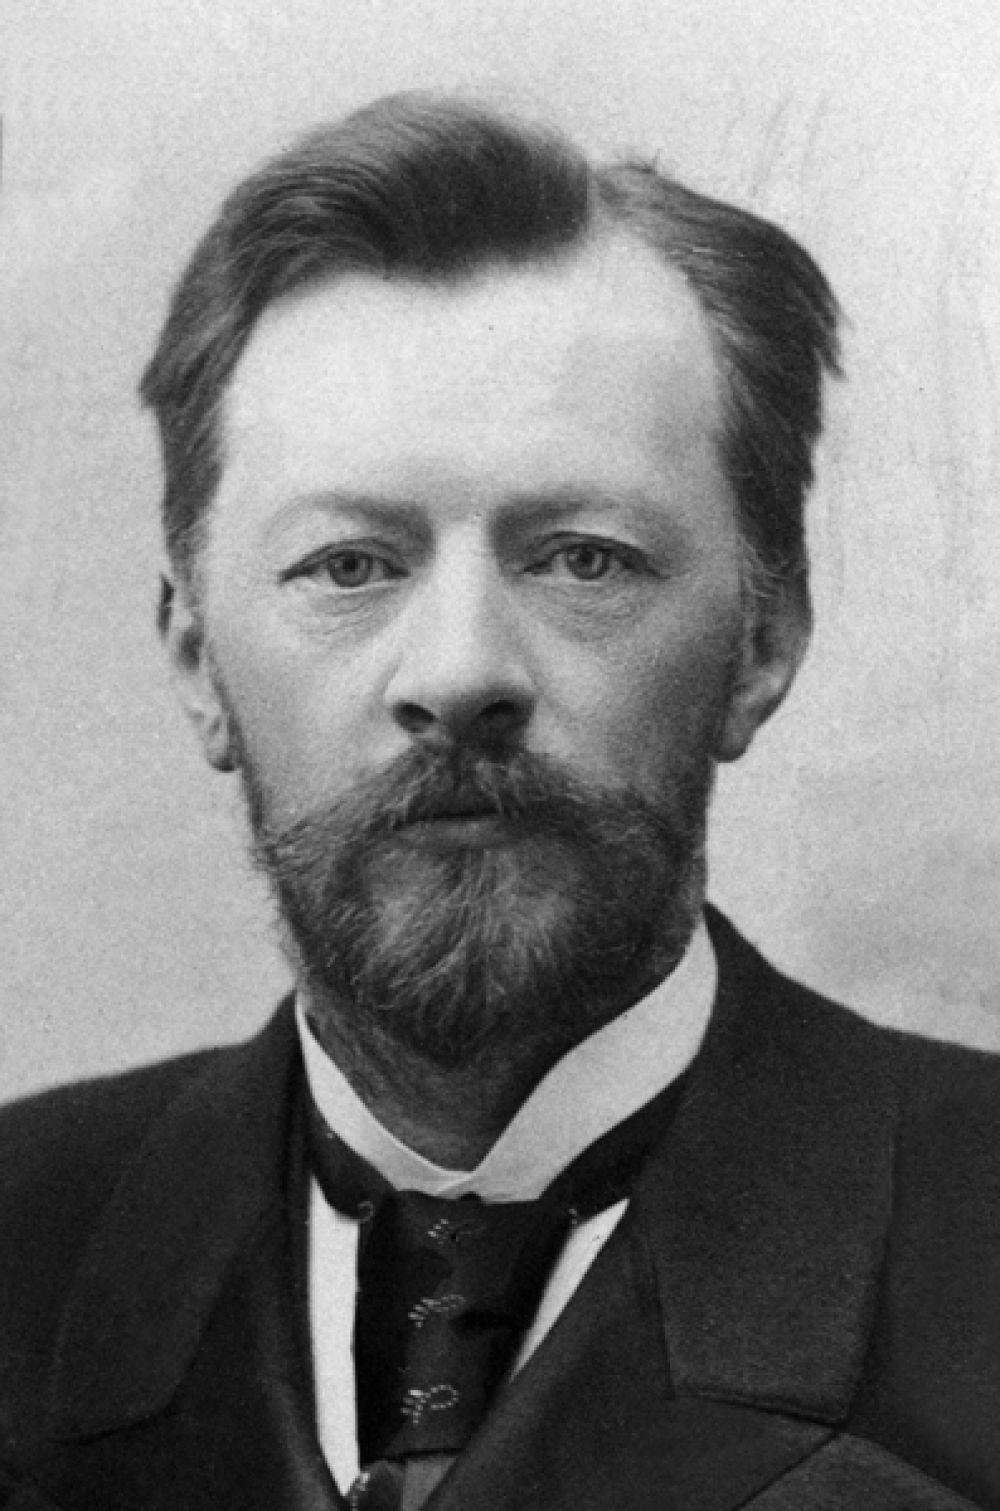 Белгород — инженер Владимир Шухов.